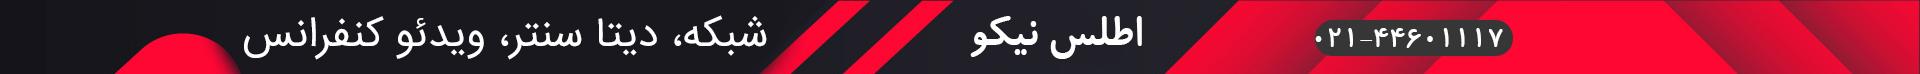 header dgs banner - اطلس نیکو